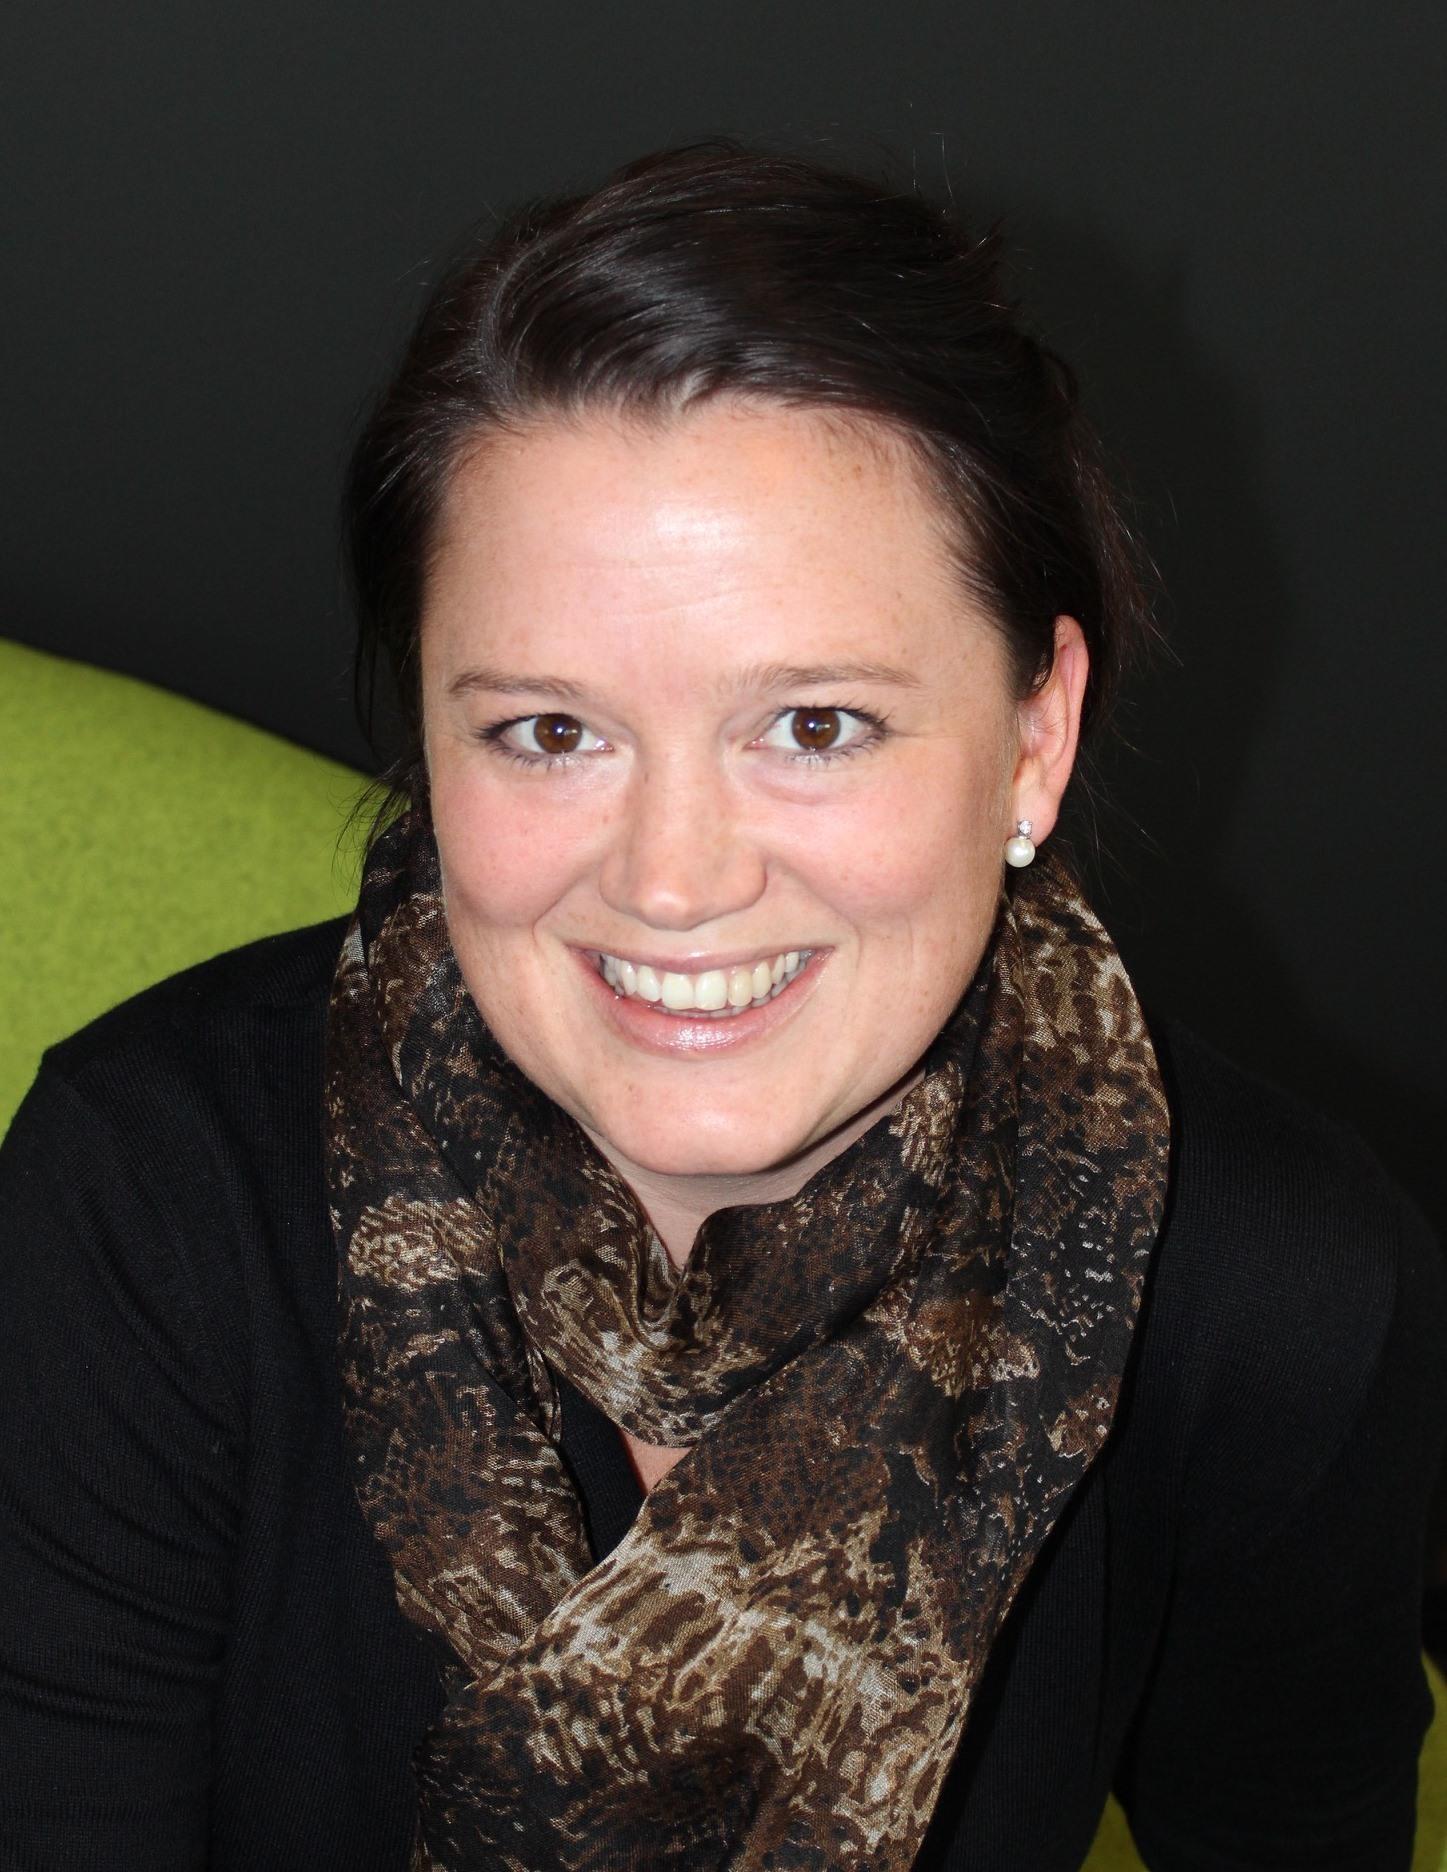 Marit Sælid Johannessen